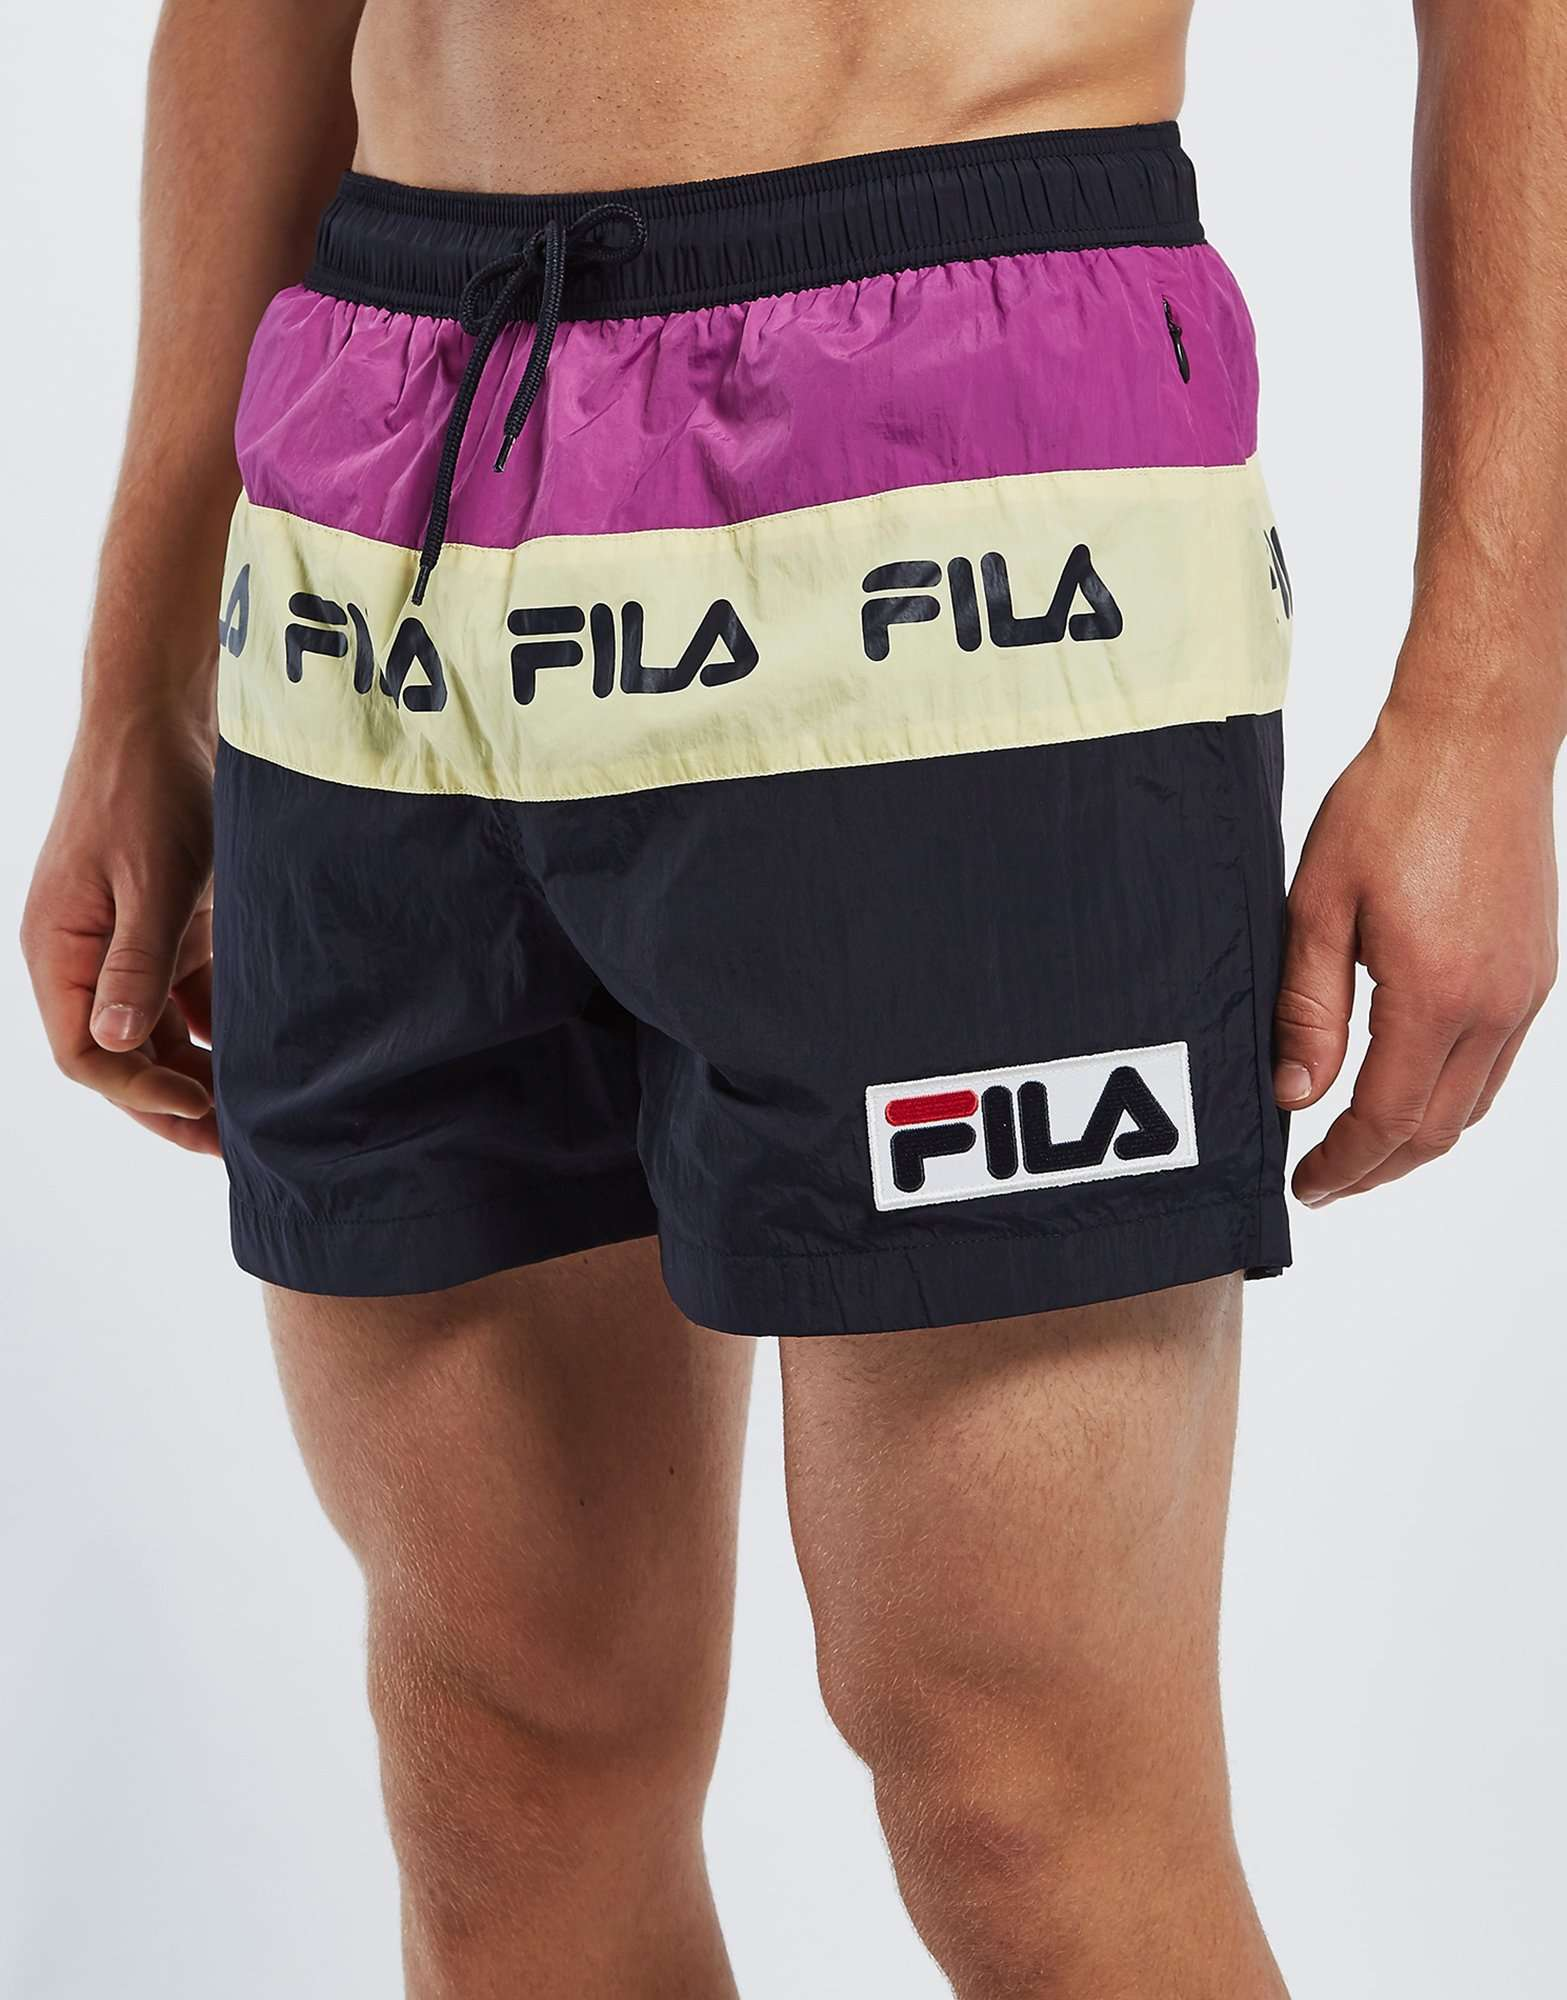 Fila Waimea Swim Shorts - Exclusive